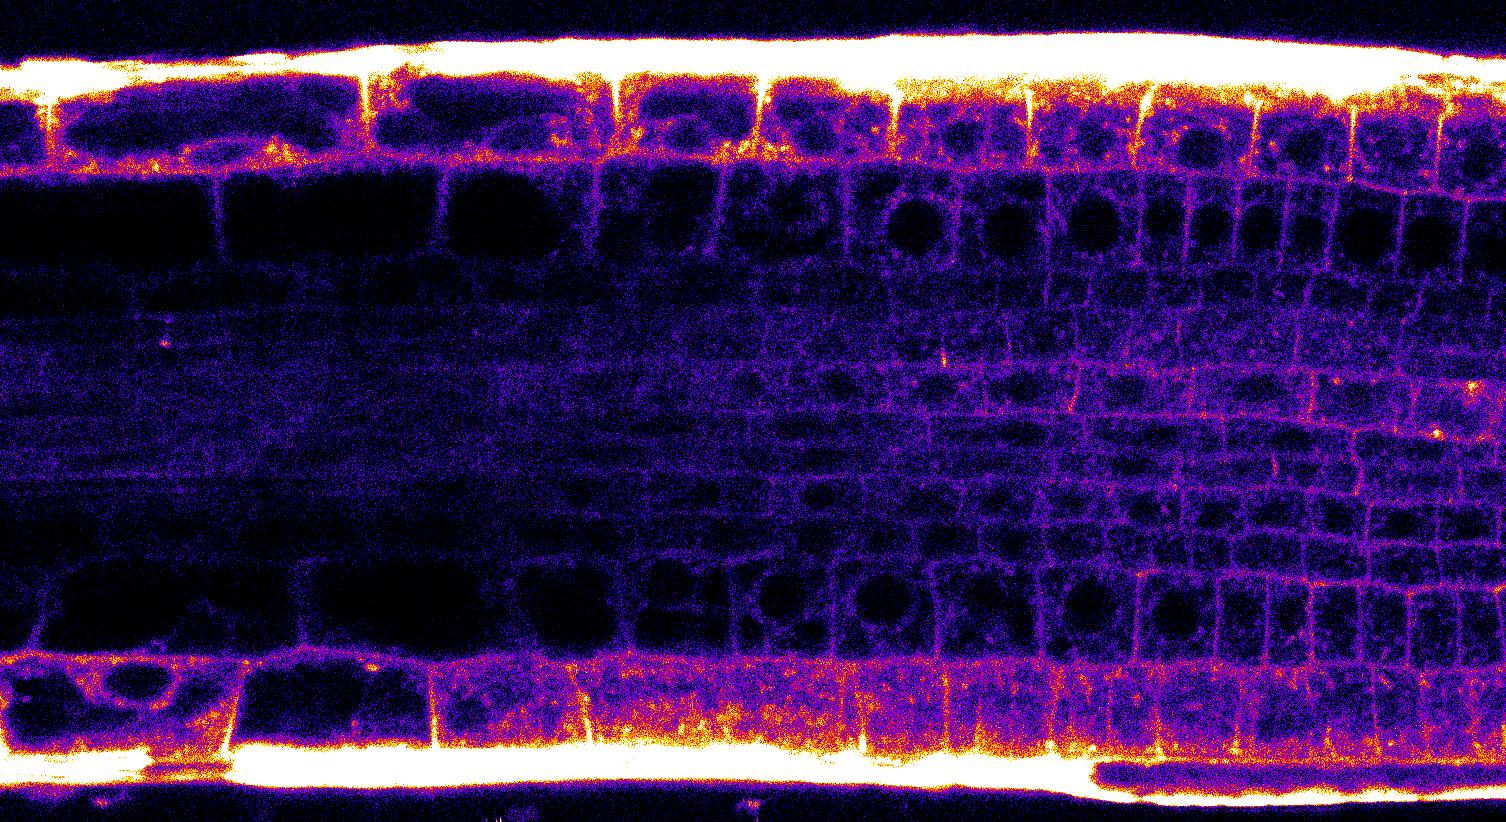 Obr.1 2 photon 40x photonCounting tz 2